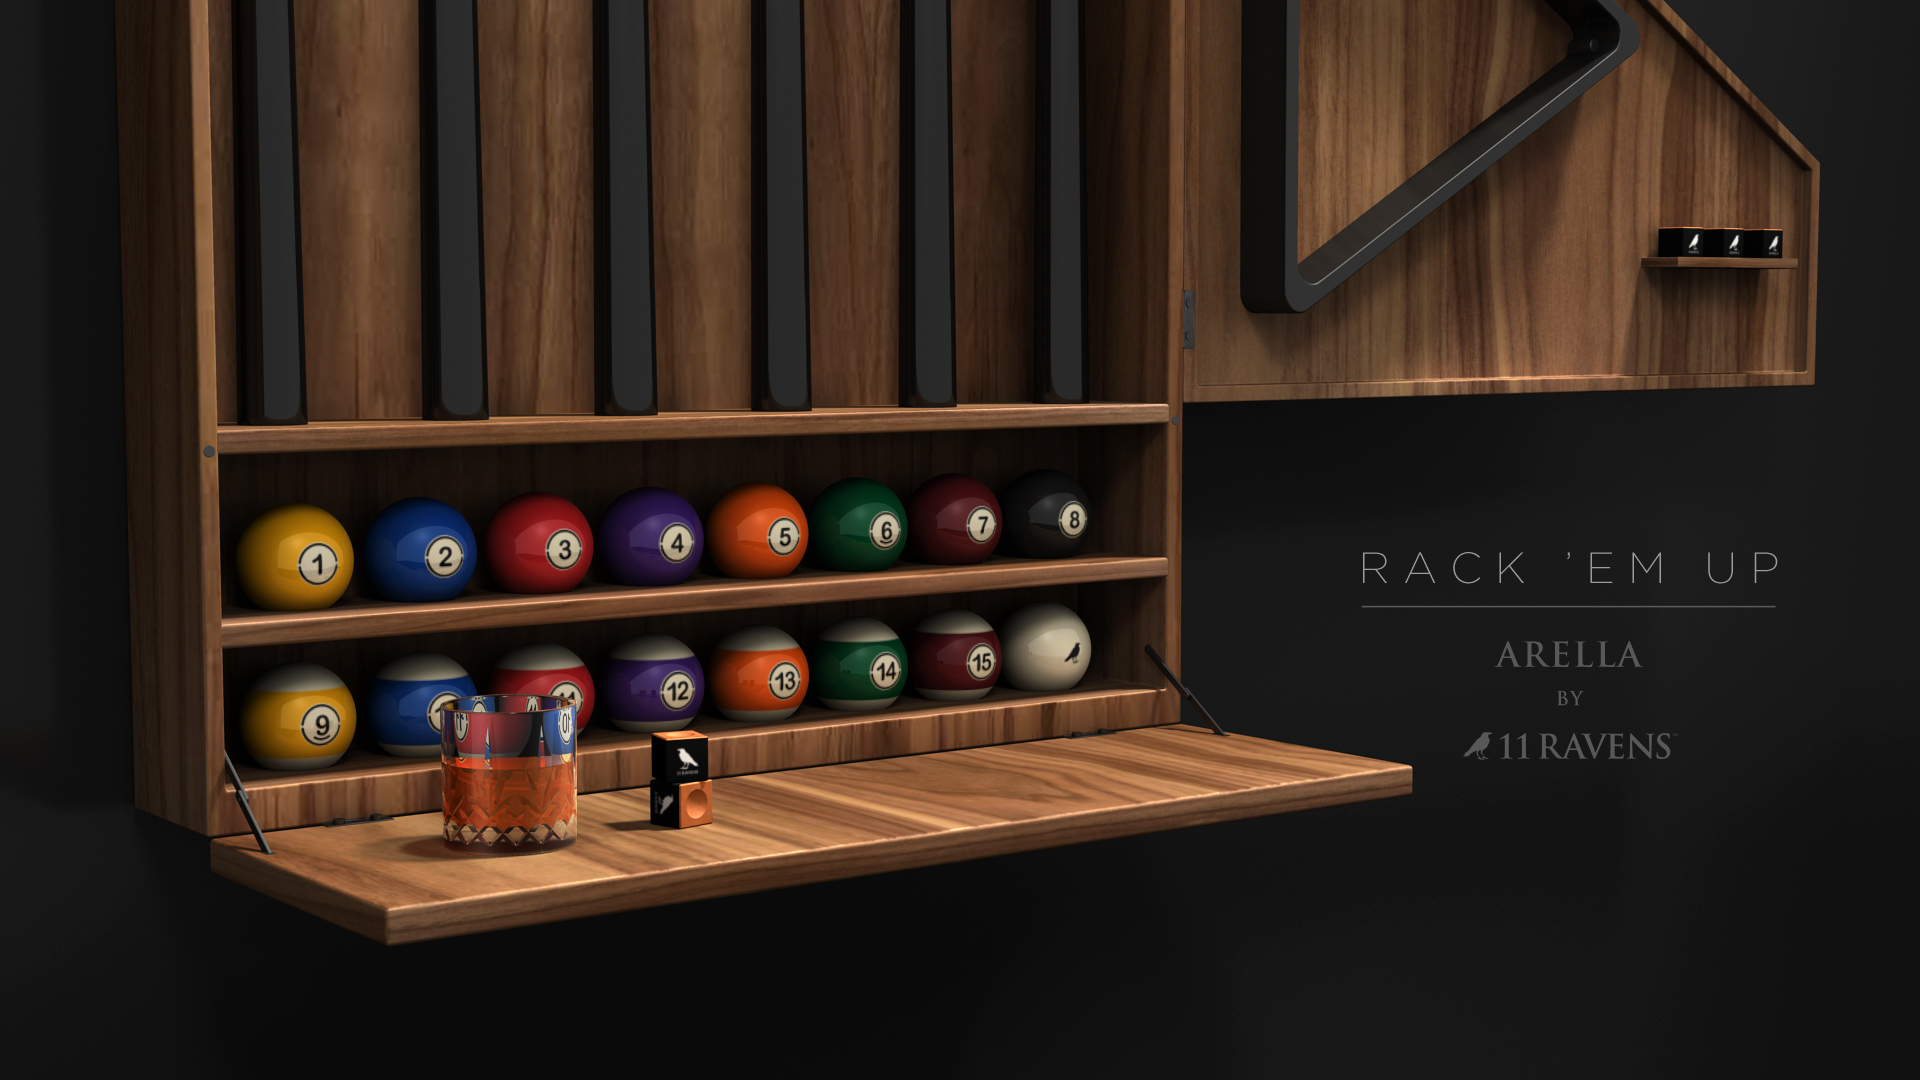 arella cue rack custom furniture